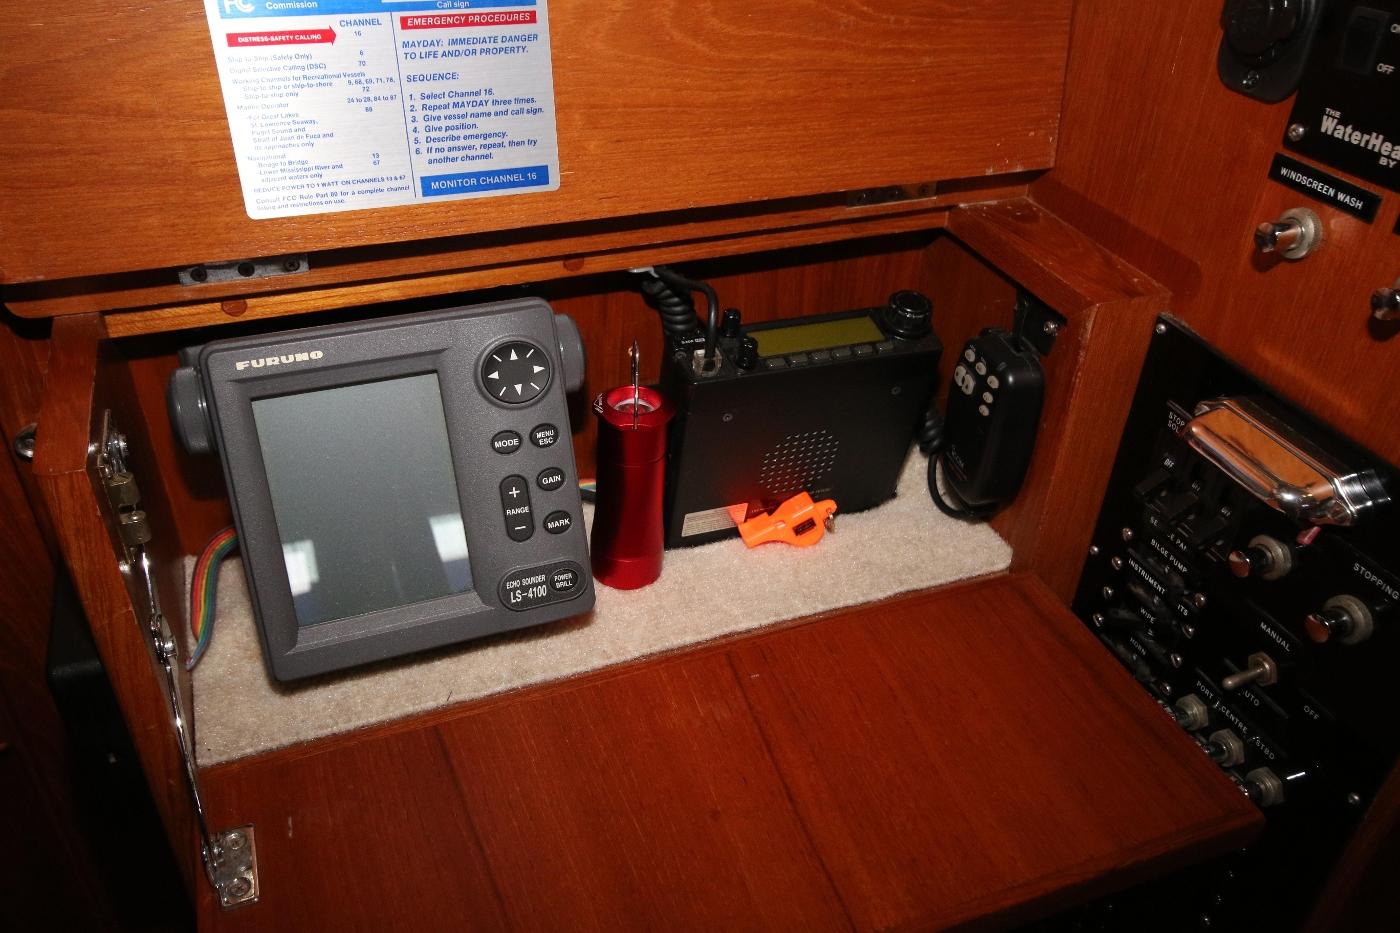 1988 Grand Banks 32, Depth Sounder & Additional VHF